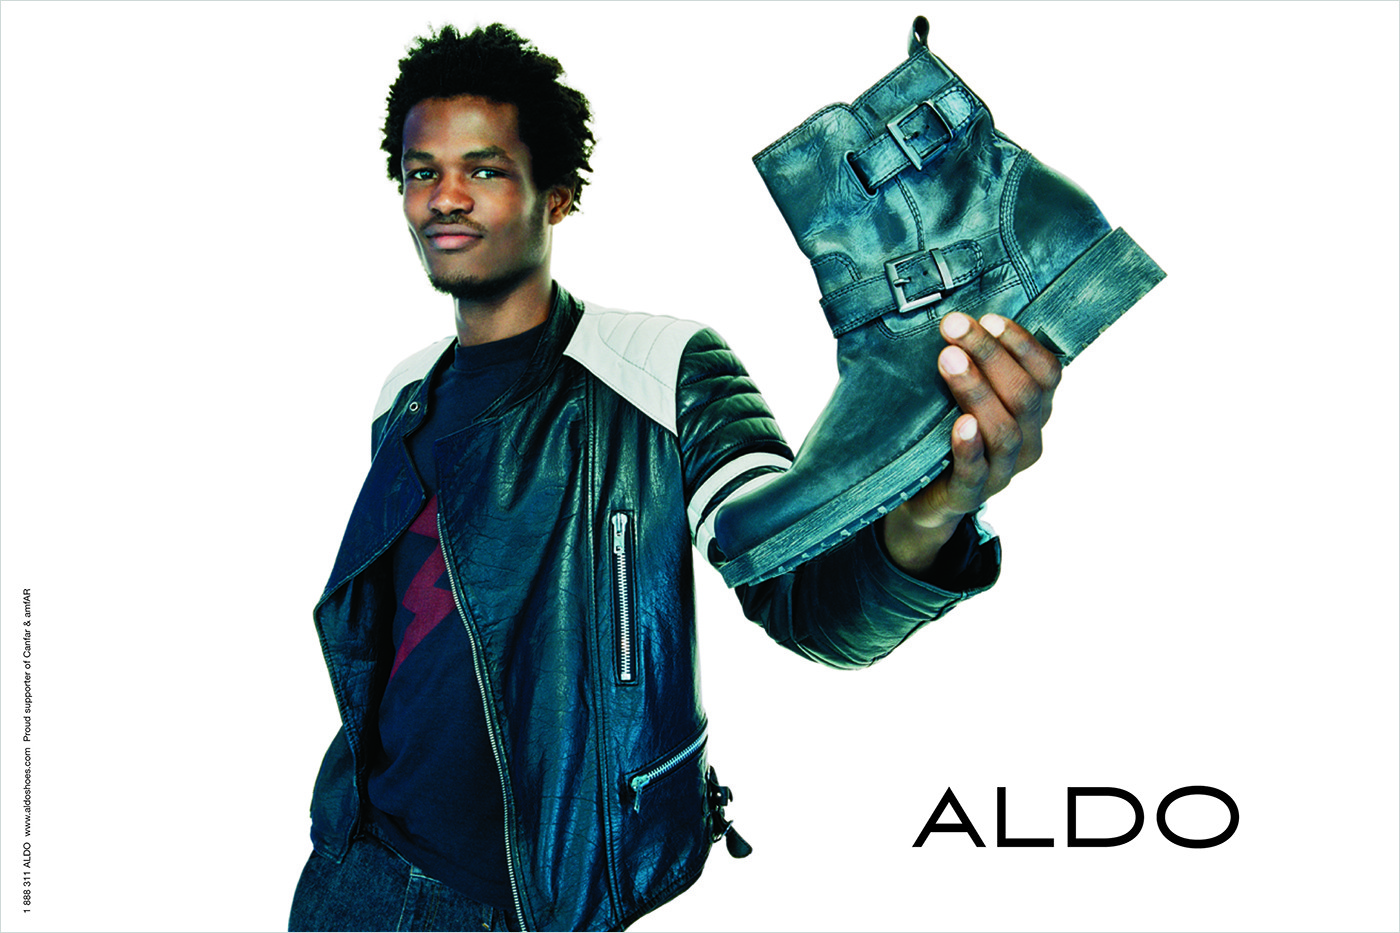 ALDO-FALL03-021-3000x2000.jpg